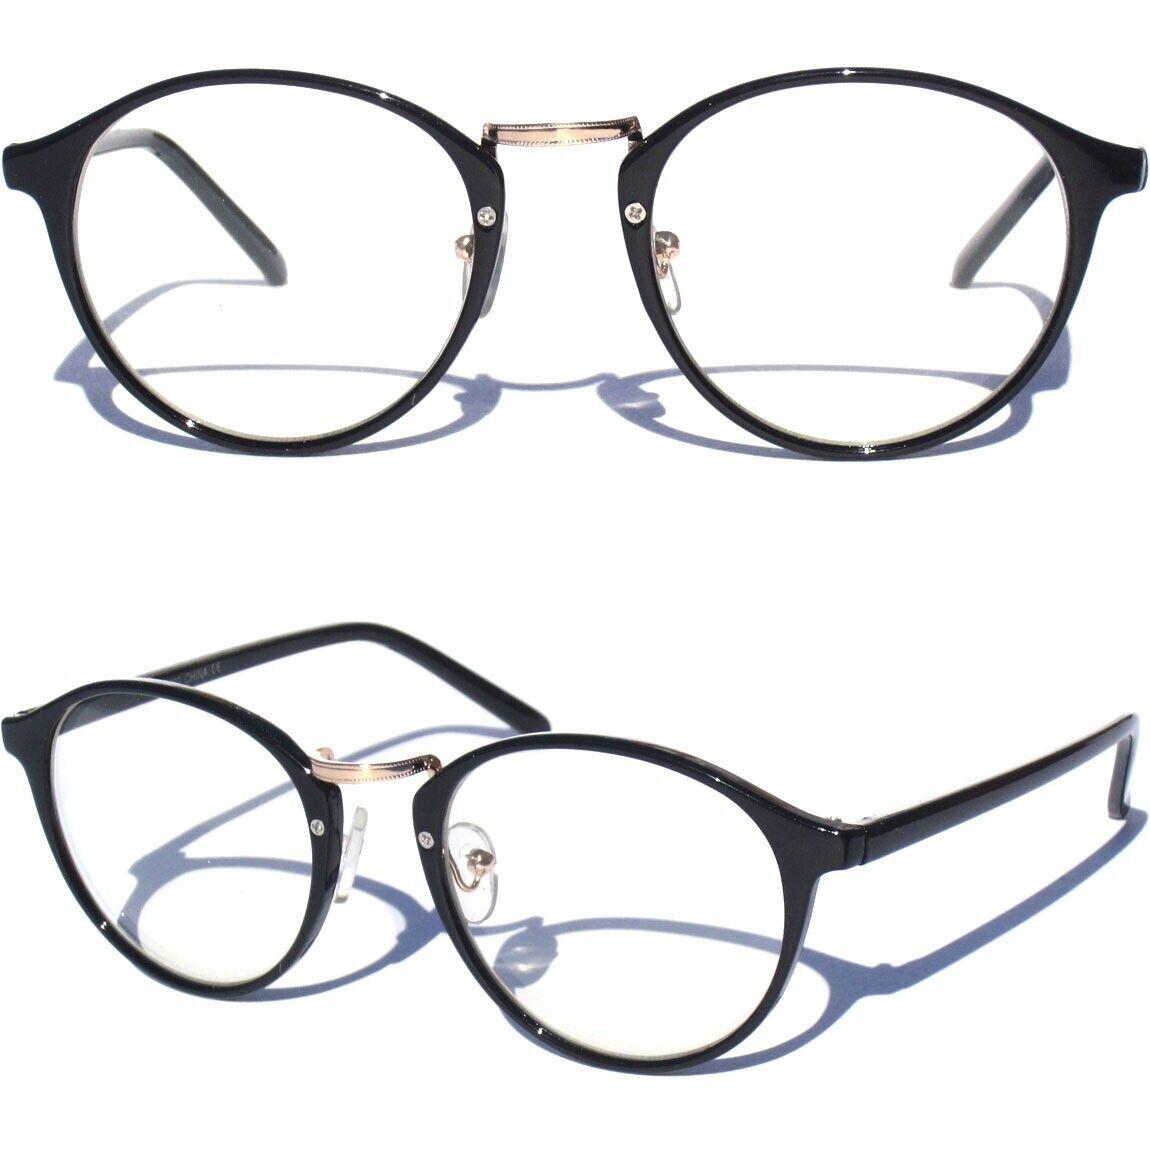 TRANSPARENT FRAME CLEAR LENS GLASSES Rounded Hipster Retro Smart Nerd Retro New